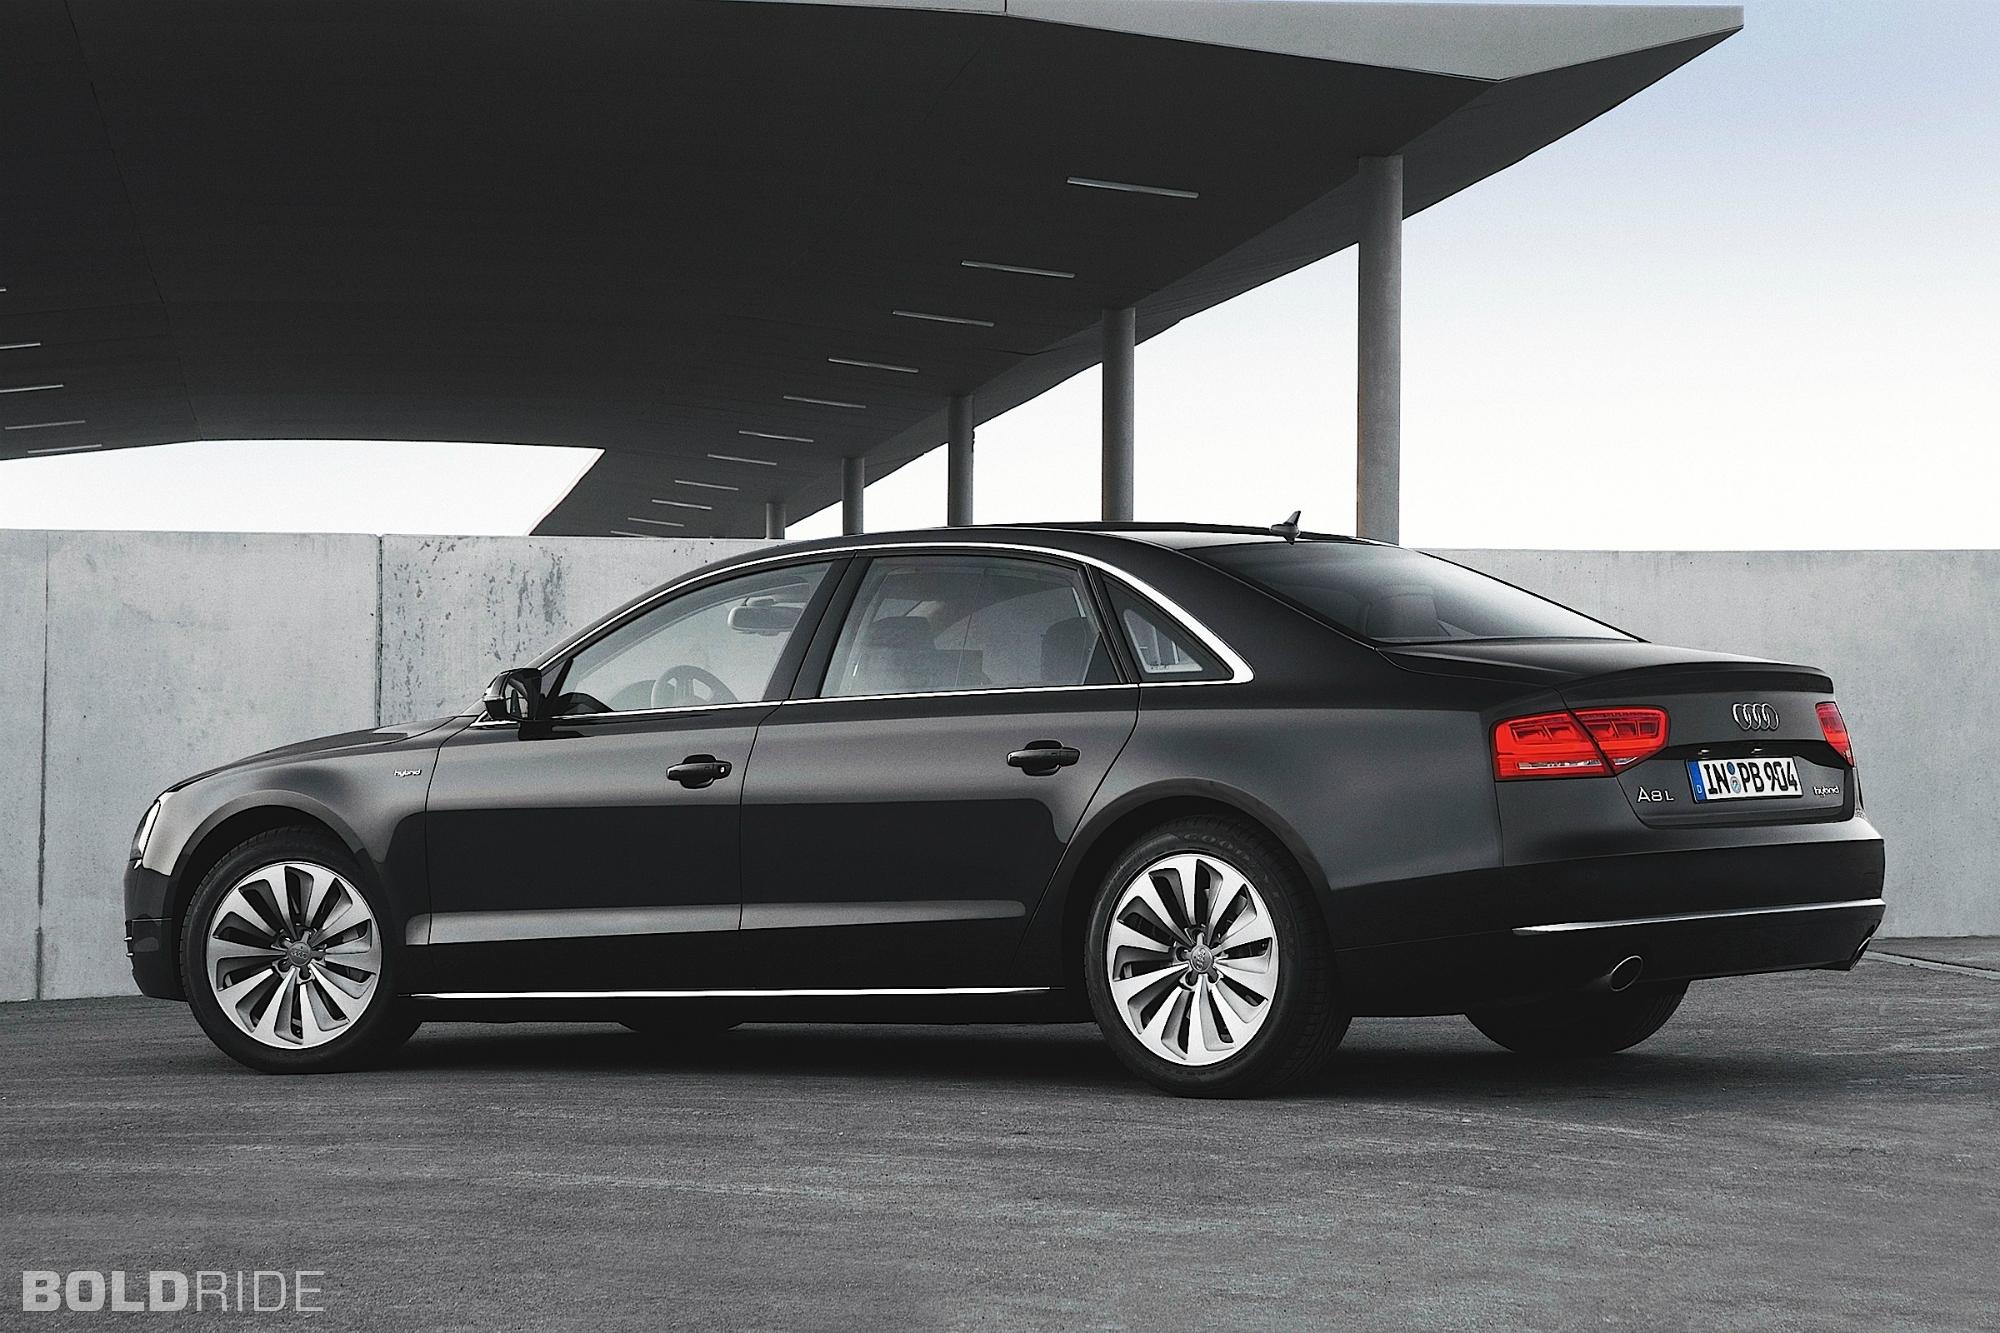 2013 Audi A8 Image 18